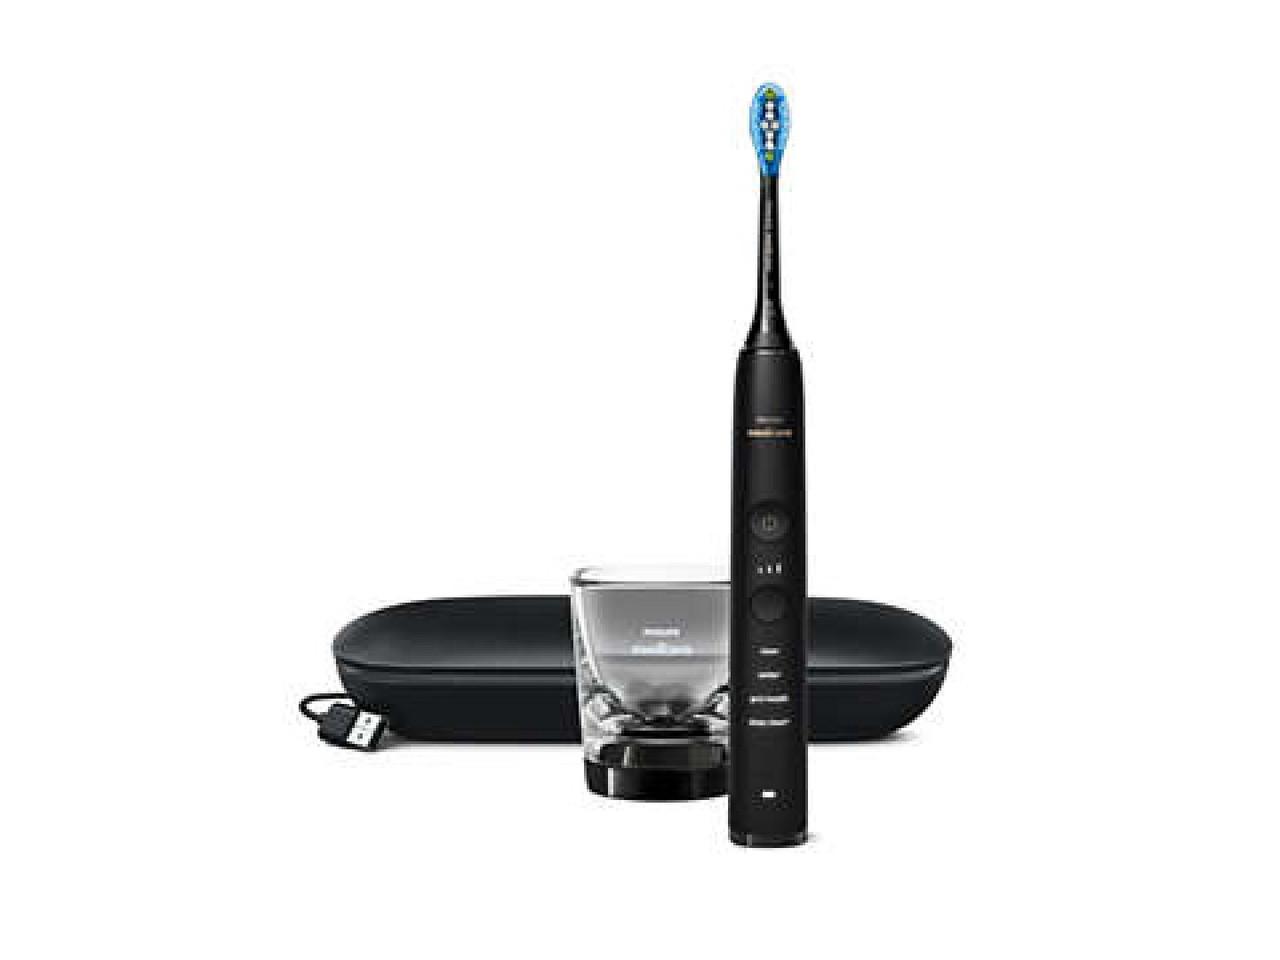 Электрическая зубная щетка Philips DiamondClean 9000 HX9911/09